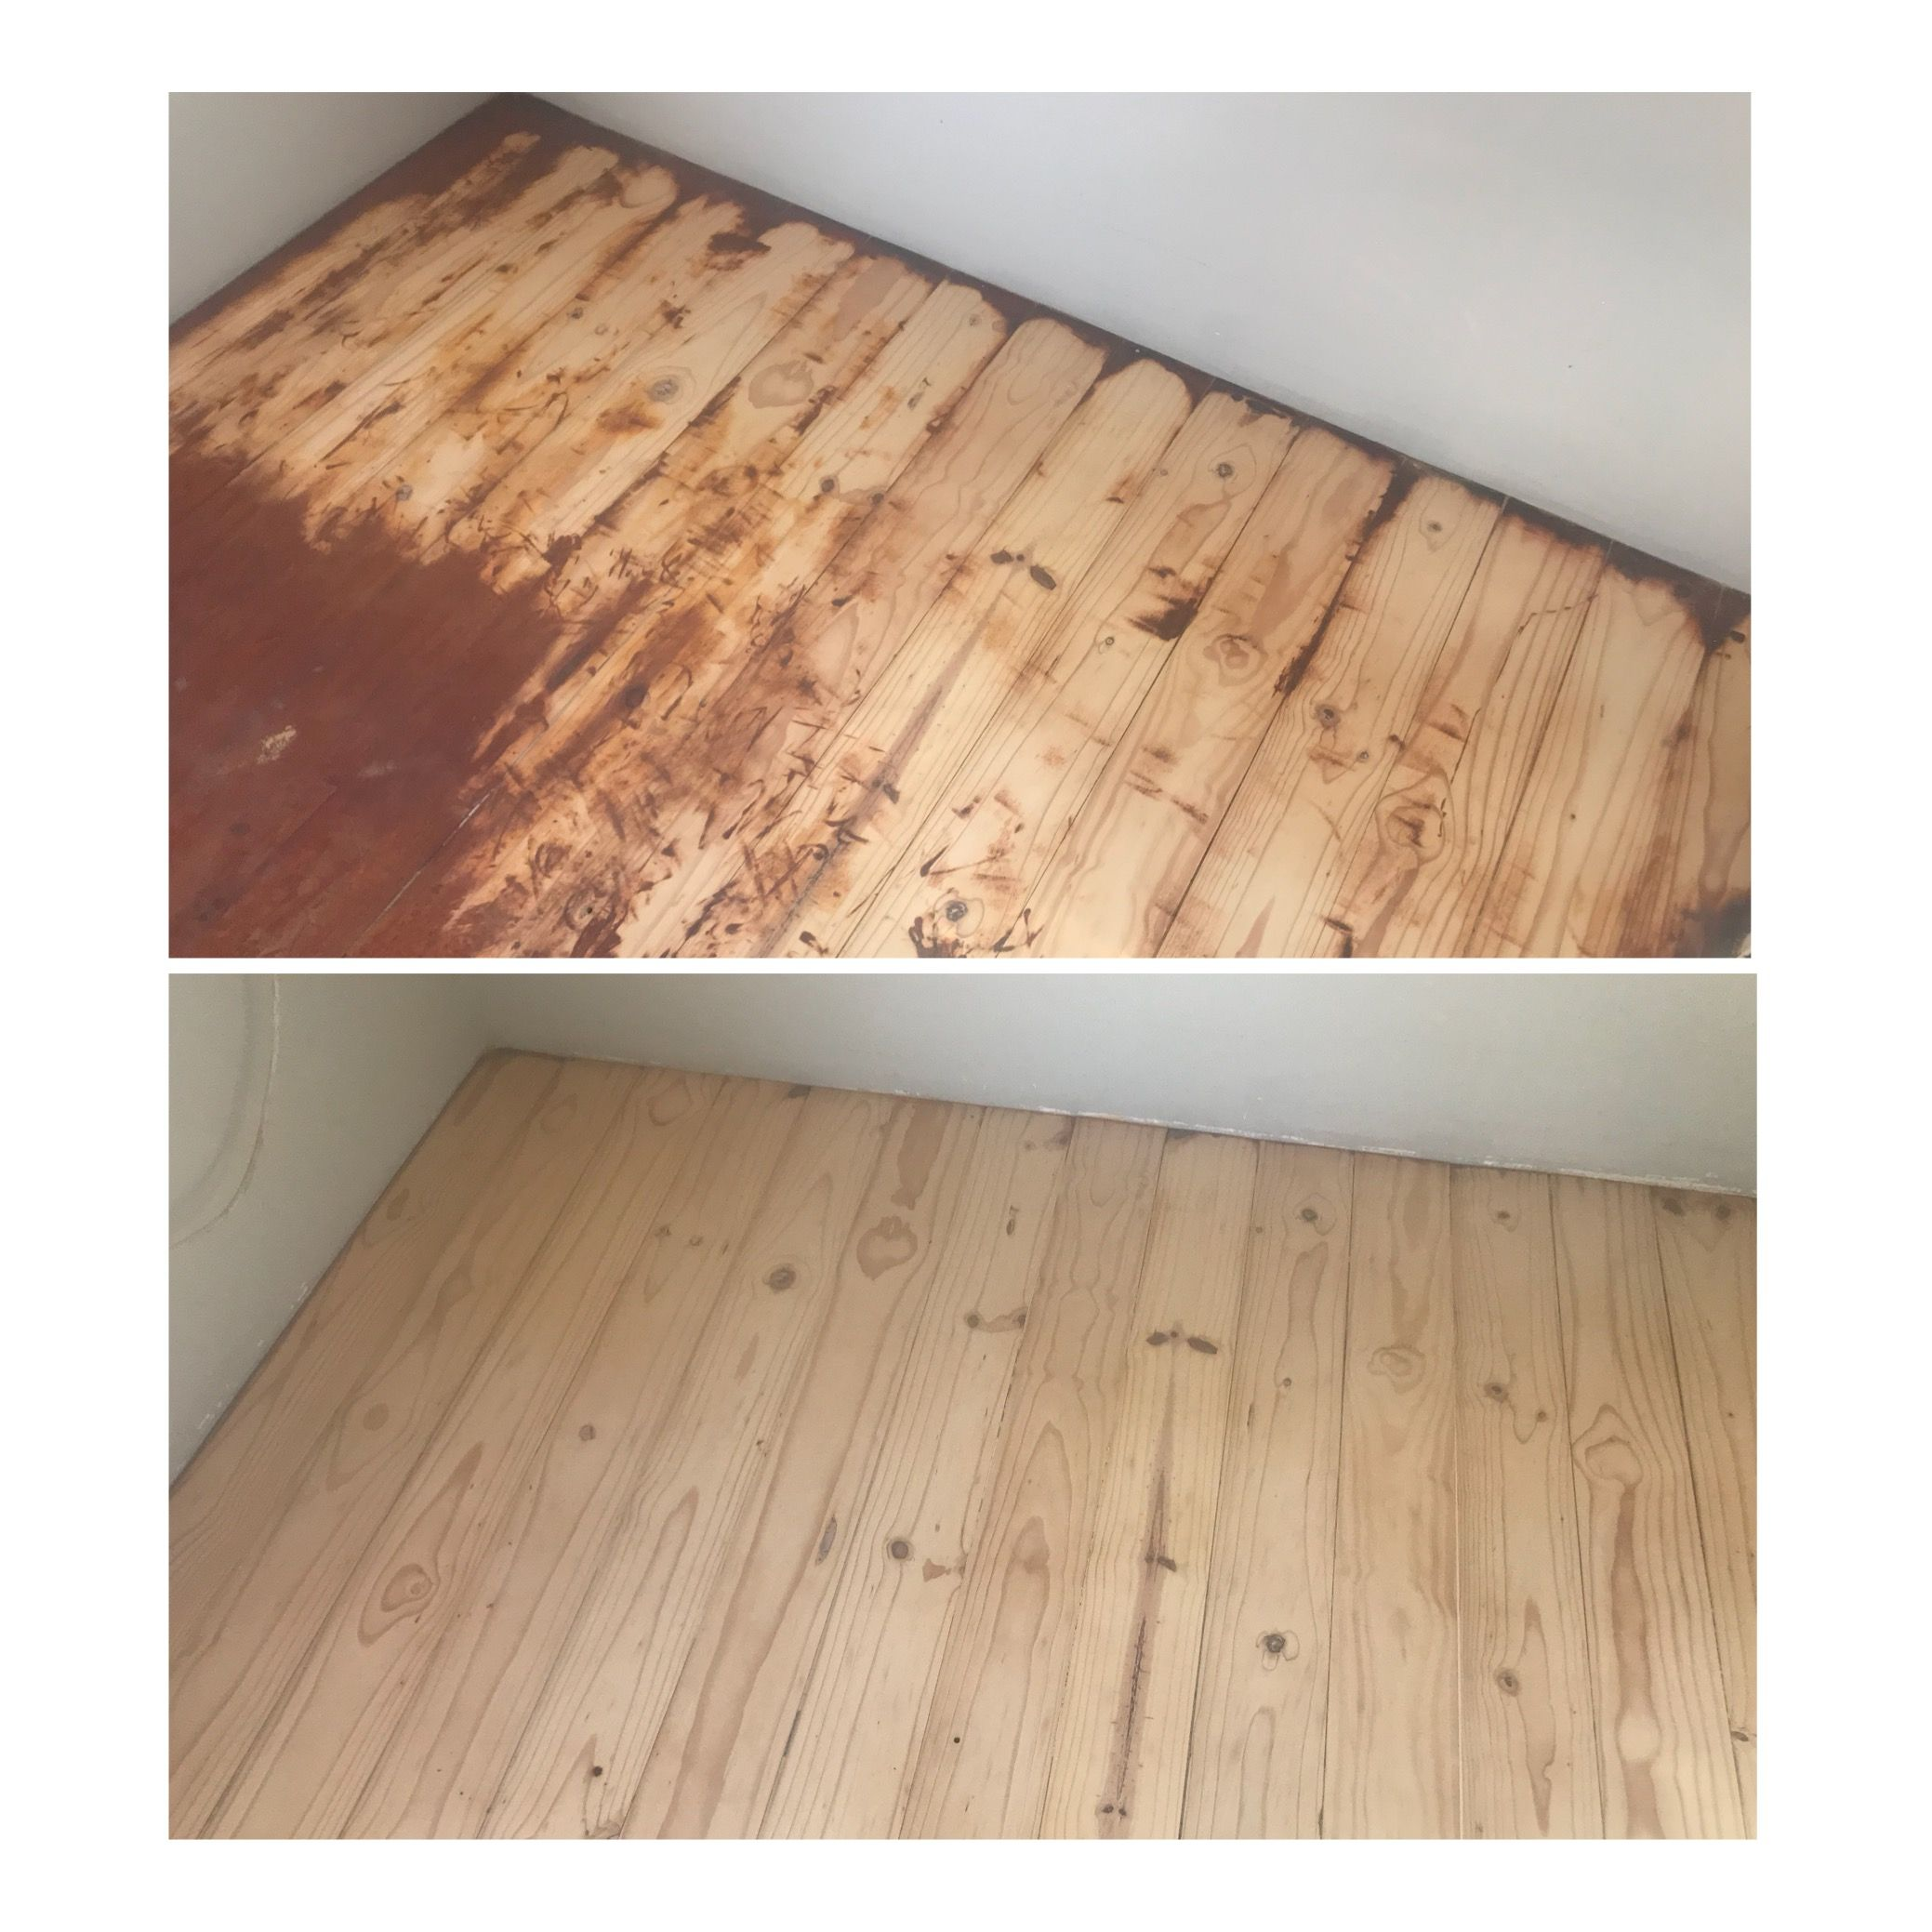 Pin by Lizl Stegmann on DIY projects | Diy flooring, Diy ...